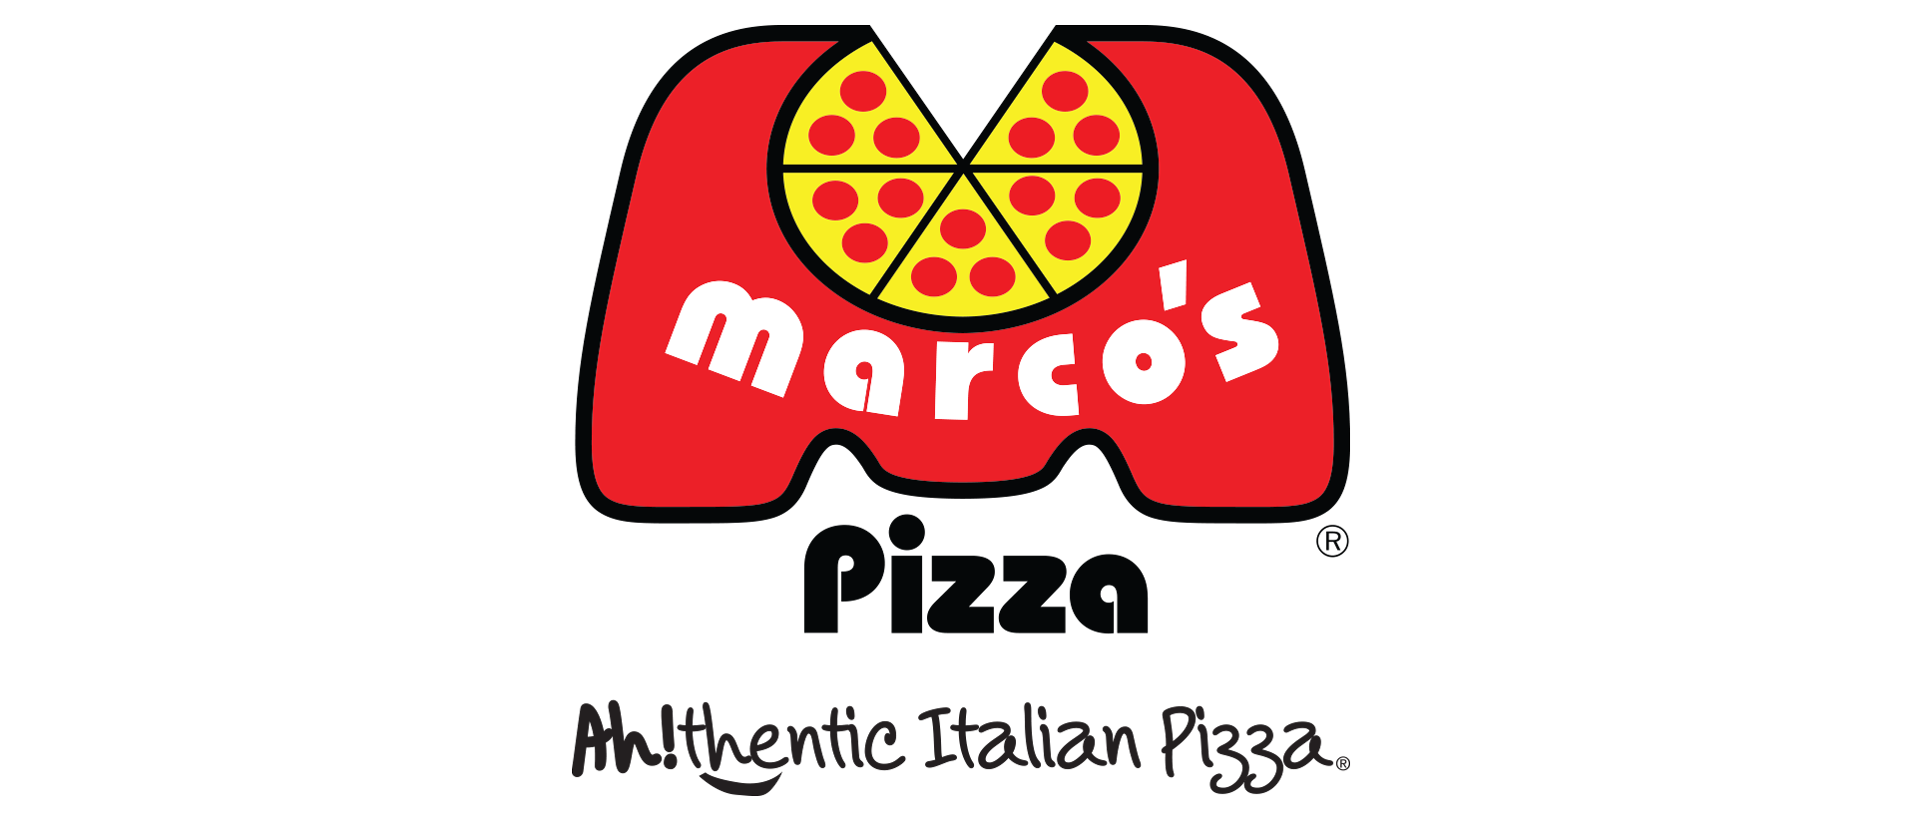 Marcos pizza Logos